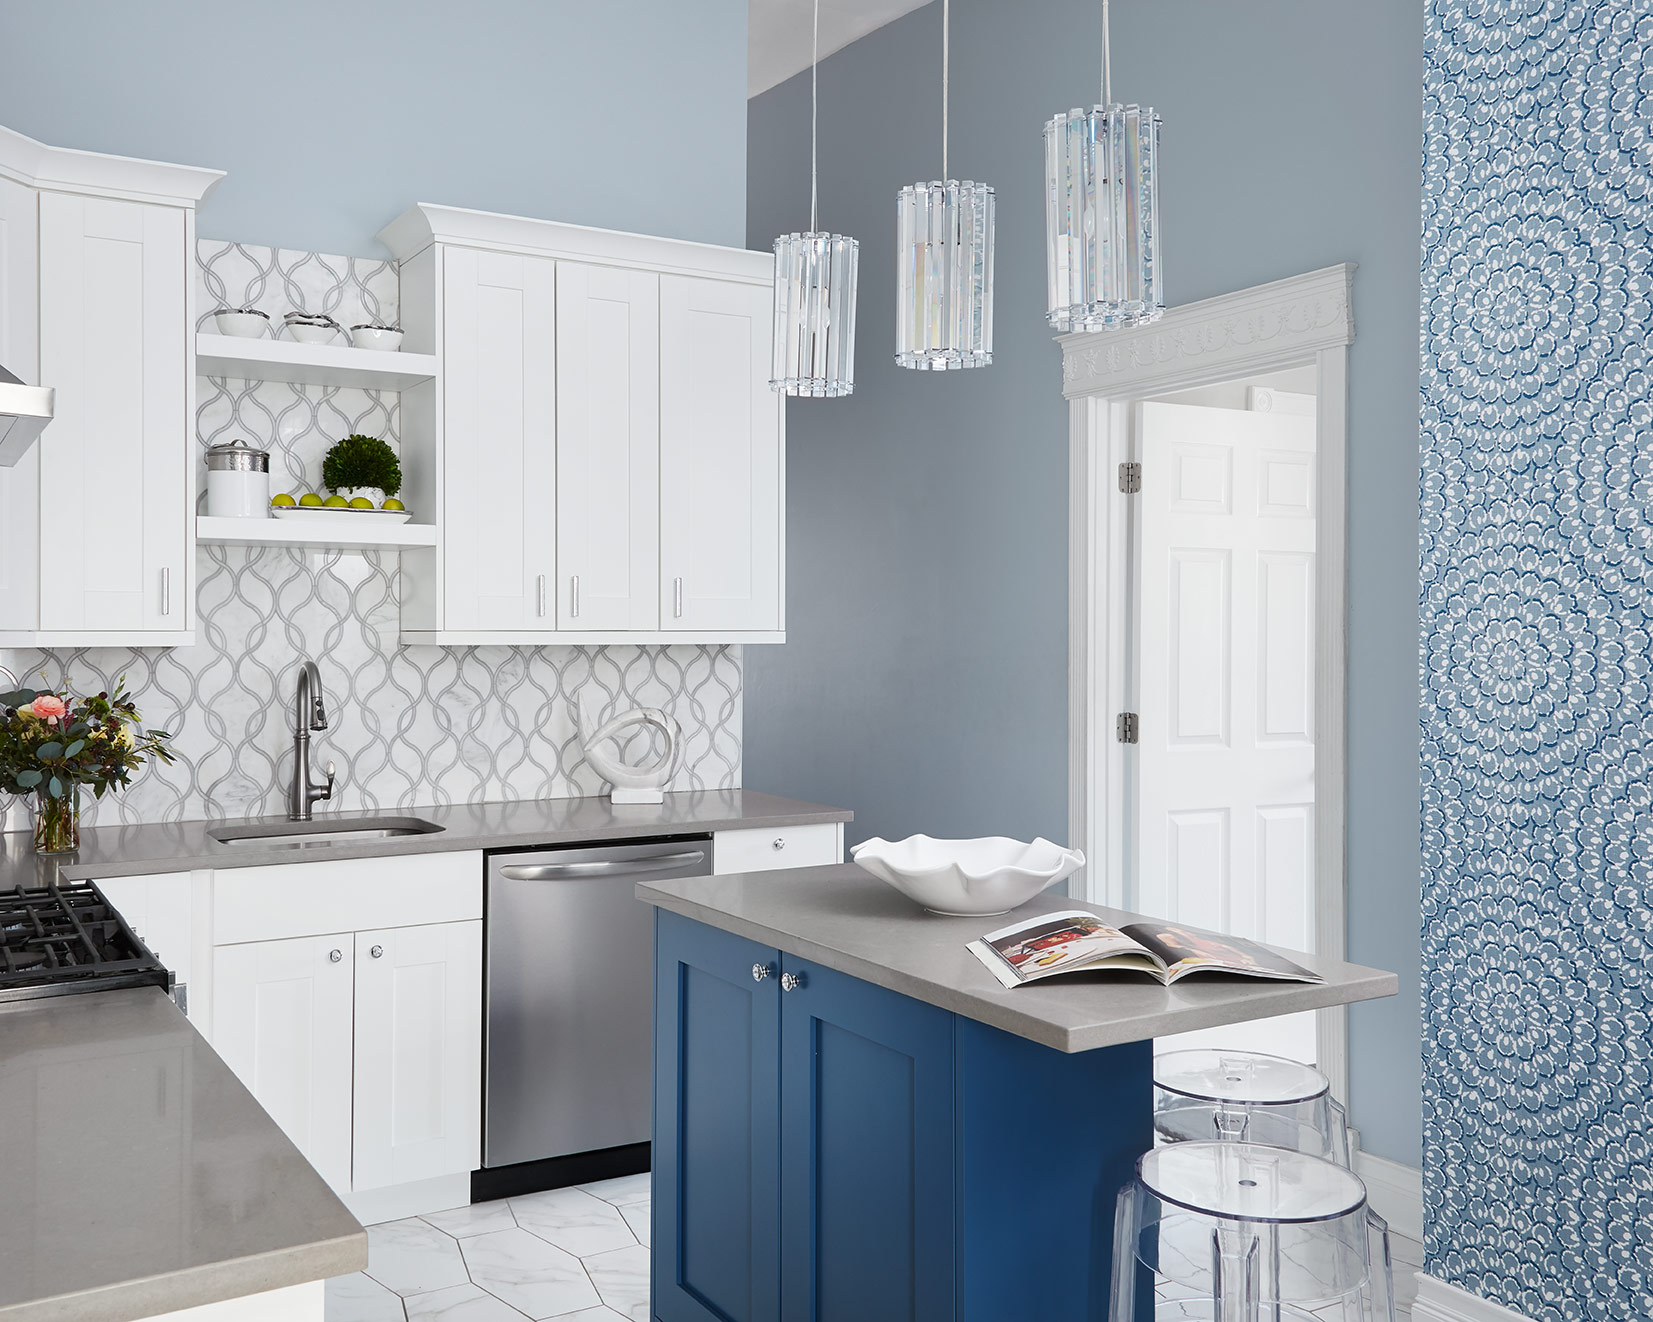 Kitchen - Interior Design by Paula Interiors